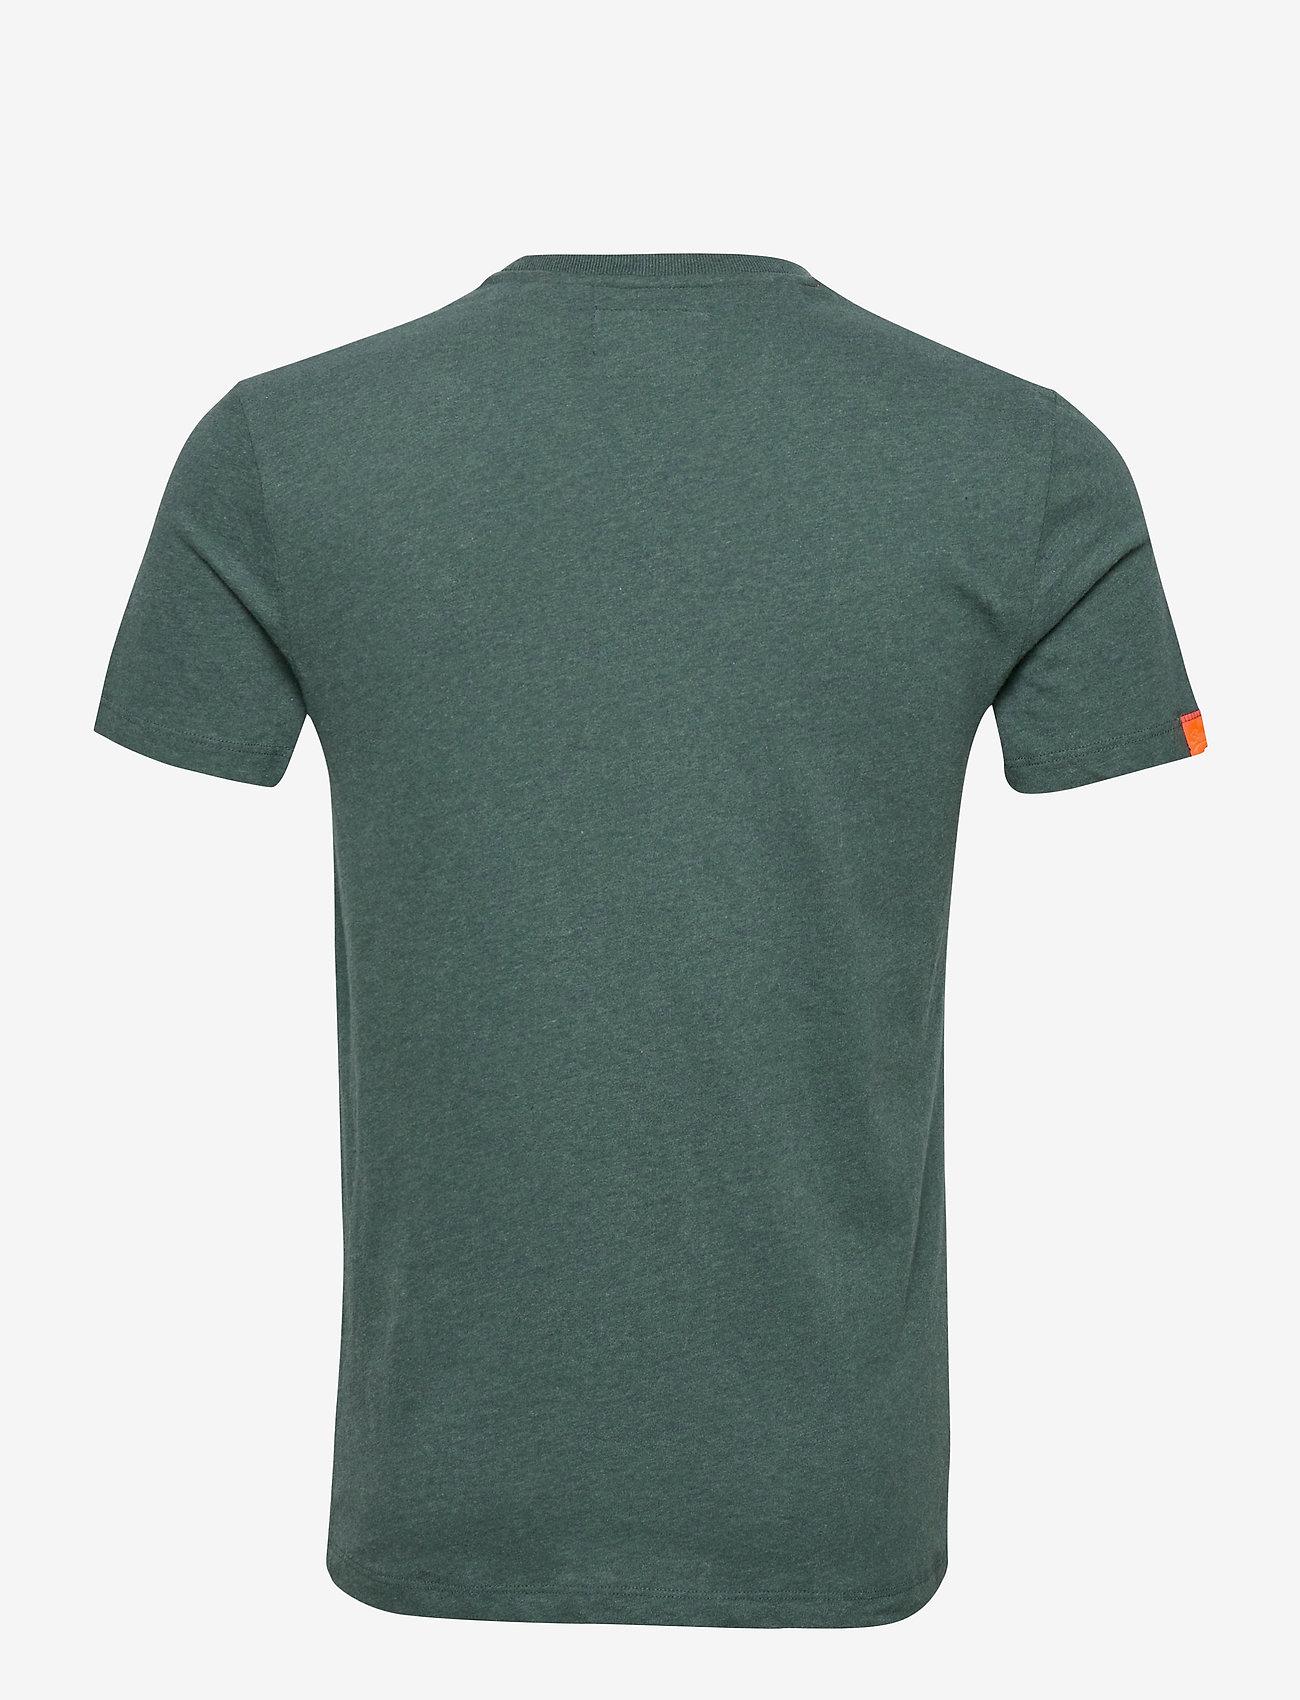 Superdry OL VINTAGE EMBROIDERY TEE - T-skjorter BUCK GREEN MARL - Menn Klær